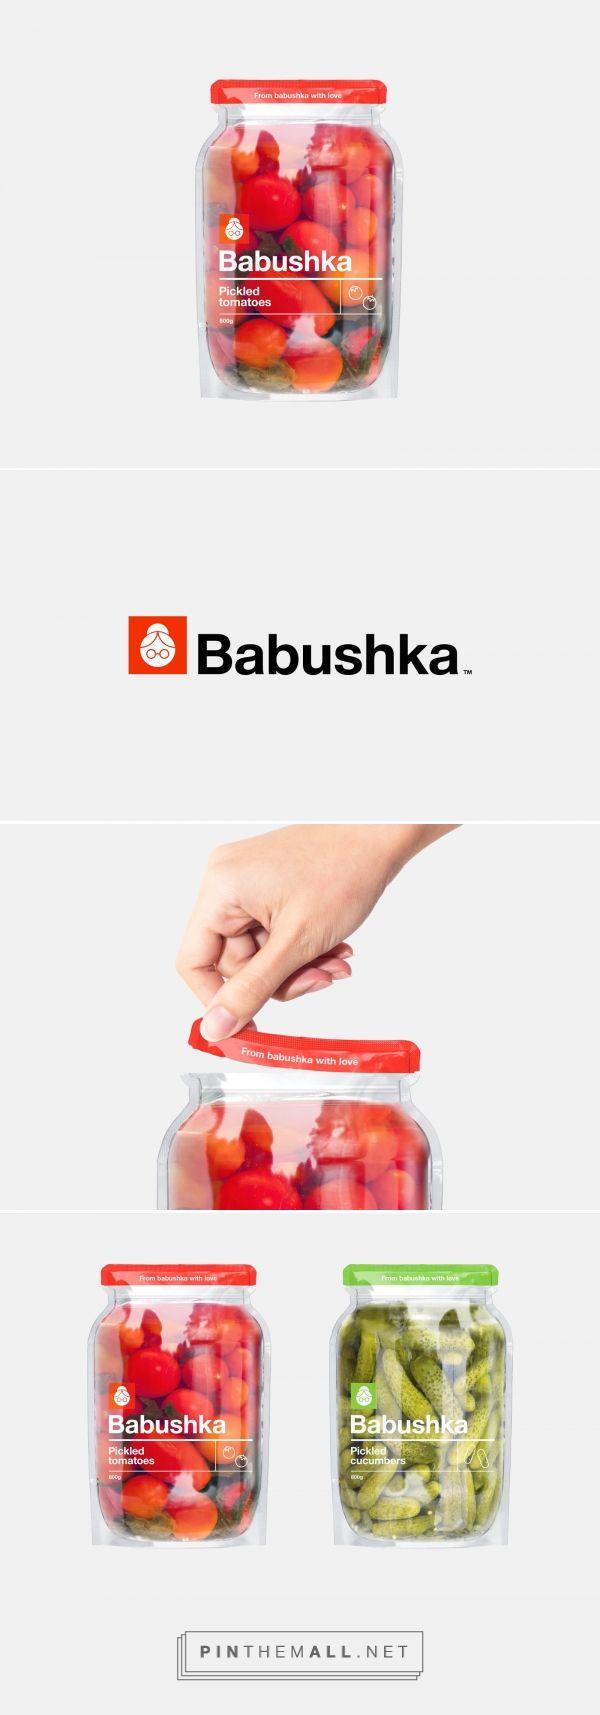 Babushka pickles packaging in doy pack - design concept by Wunderbar - http://www.packagingoftheworld.com/2017/05/babushka-concept.html